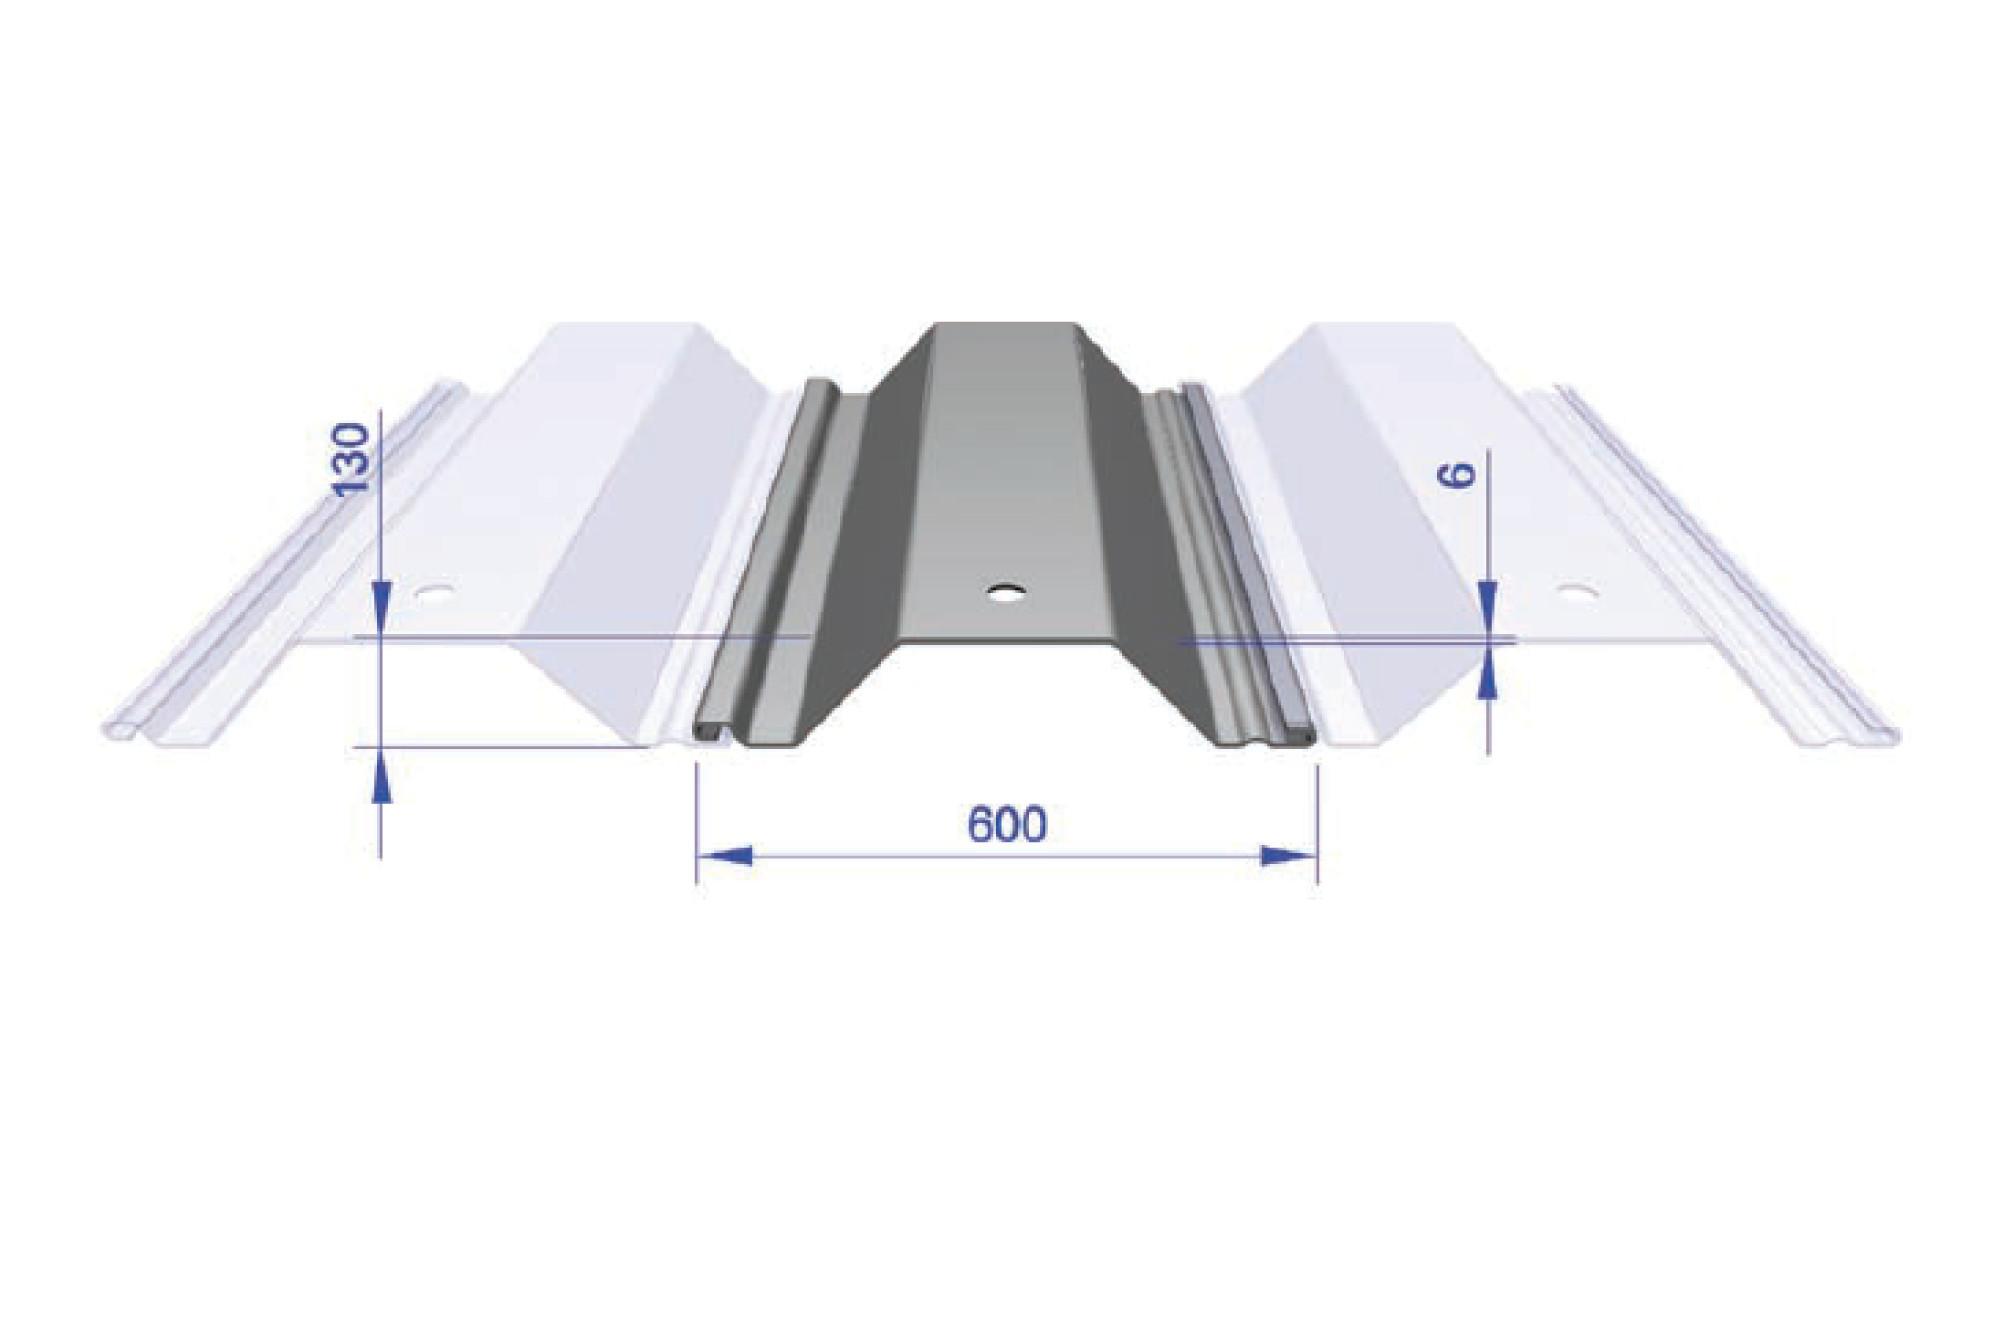 Interlocking Trench Sheet - FLP 600/6 600mm Wide